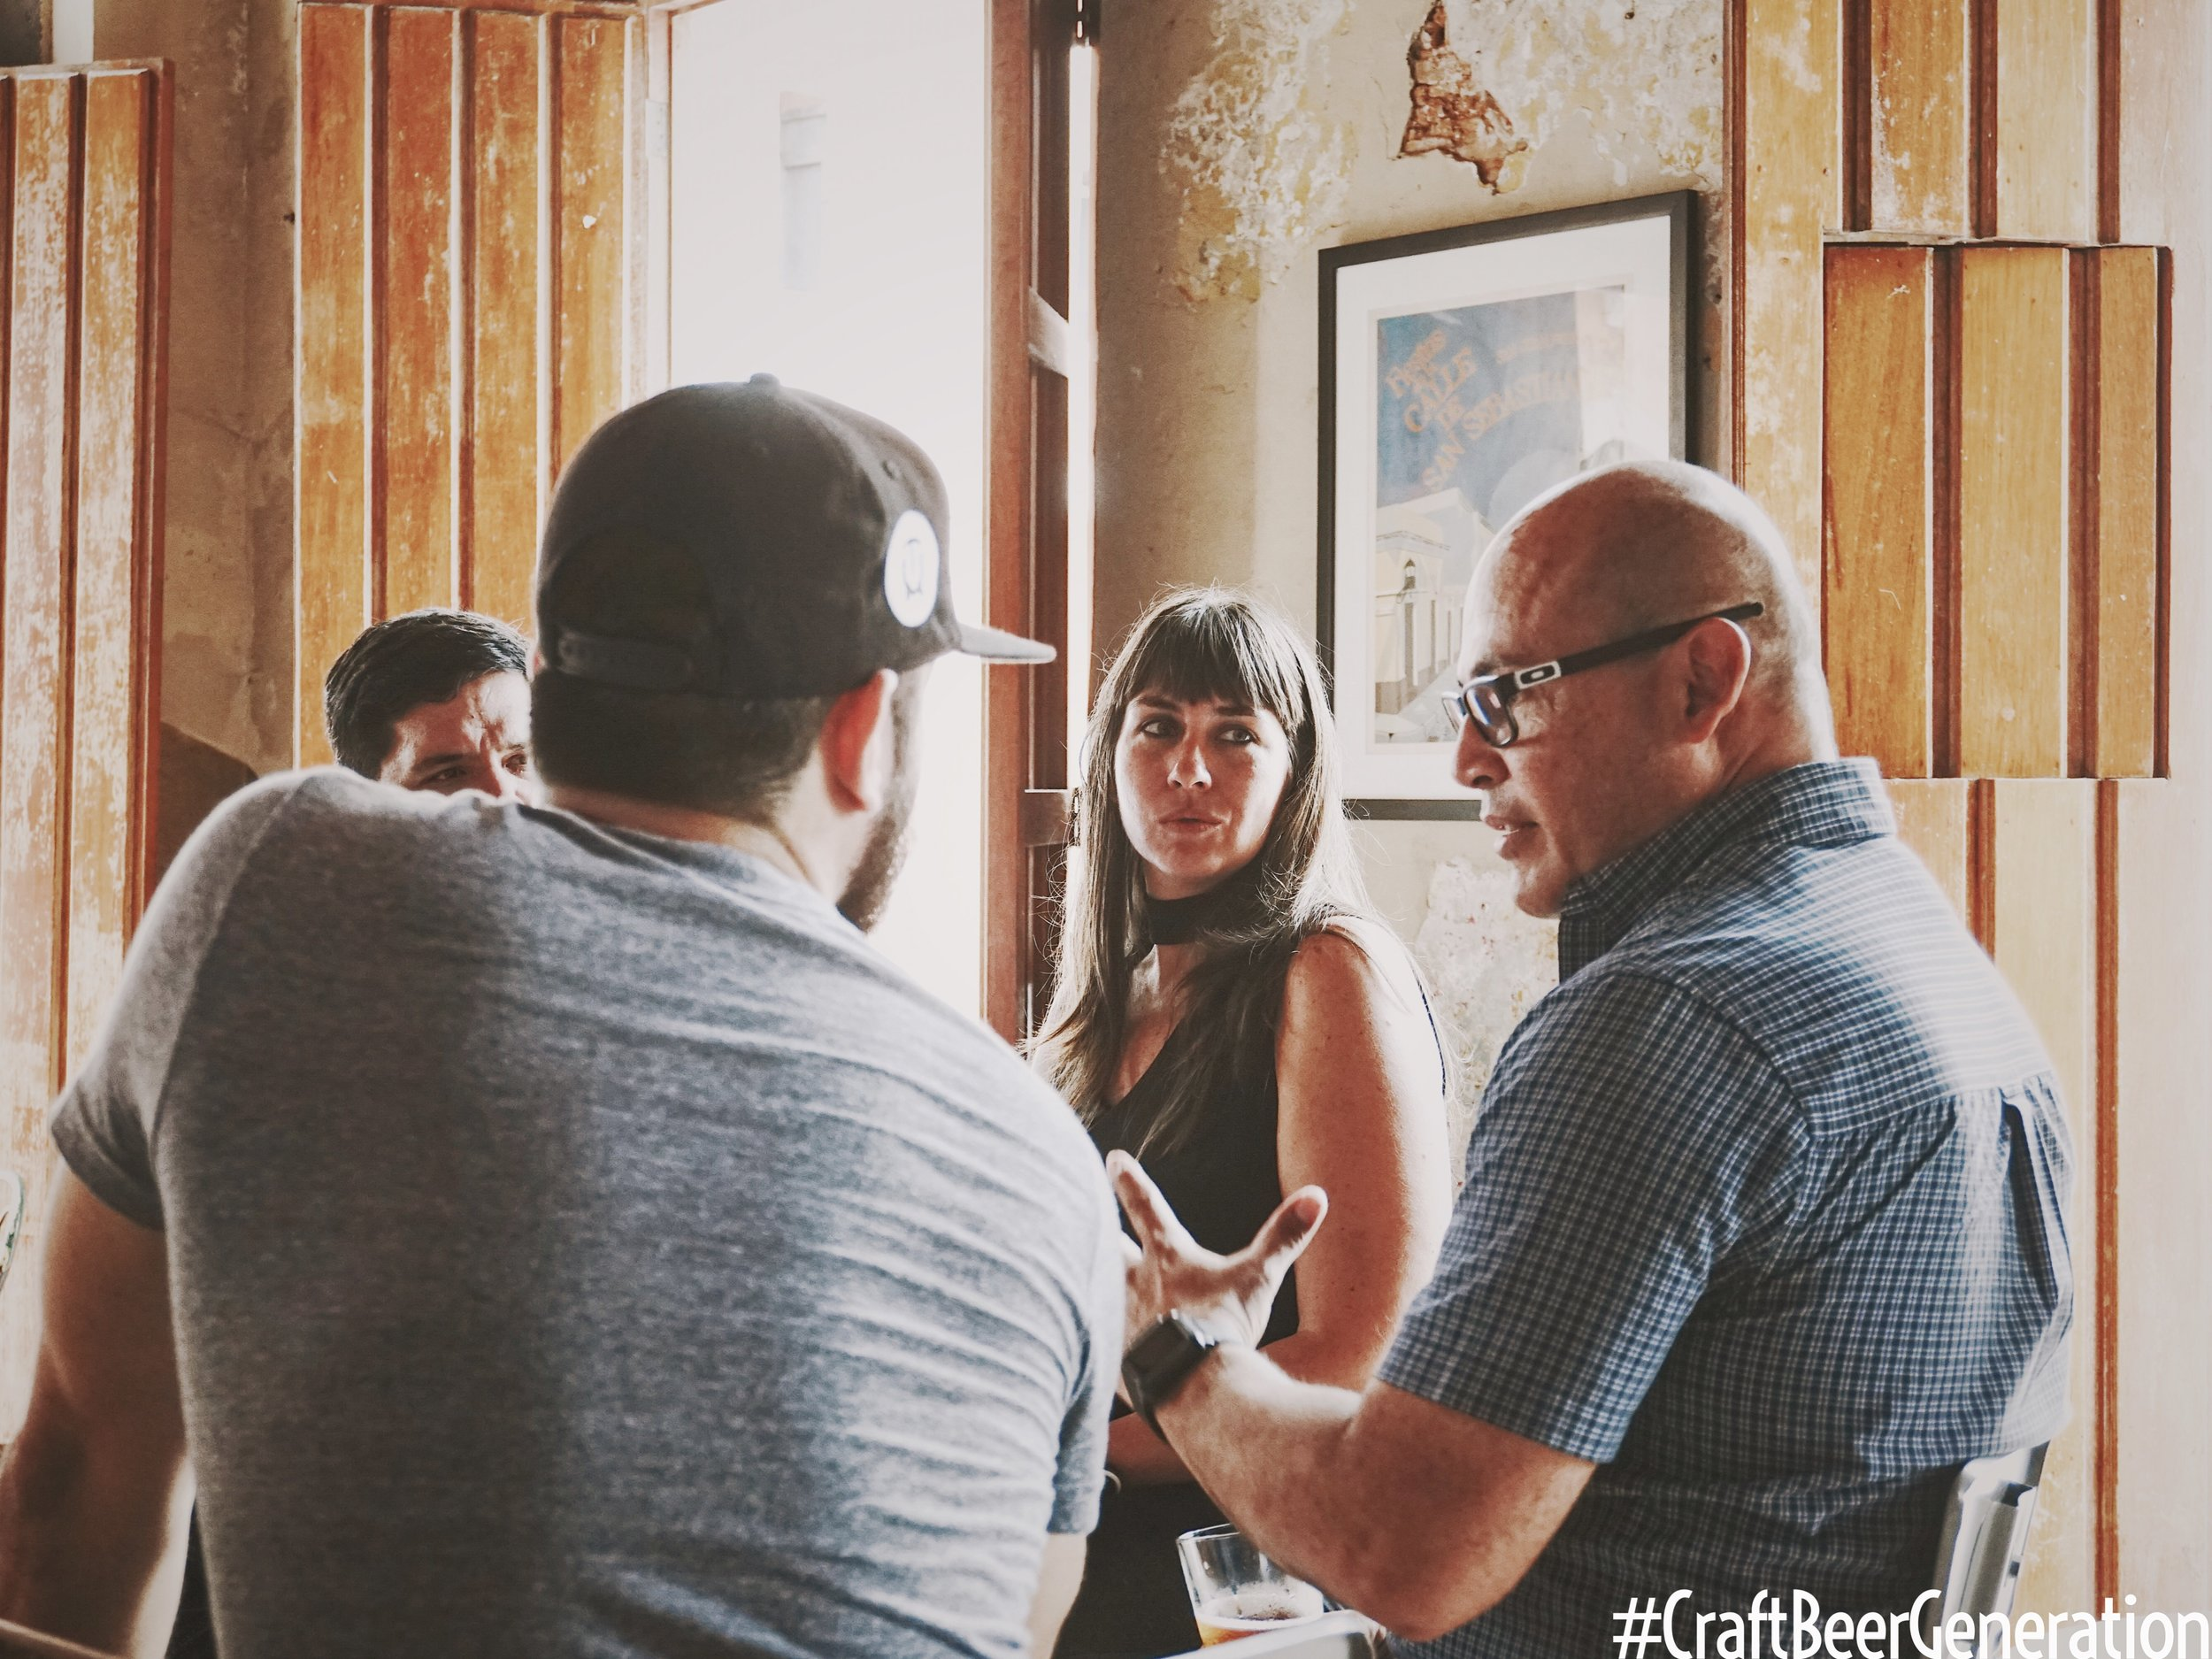 De izquierda a derecha: Gustavo Franceschini de Craft Beer Generation.Emelia Whitaker, Craft Beer Consultant de Ballester Hermanos y Humberto Díaz, Key Account Support de Ballester Hermanos.